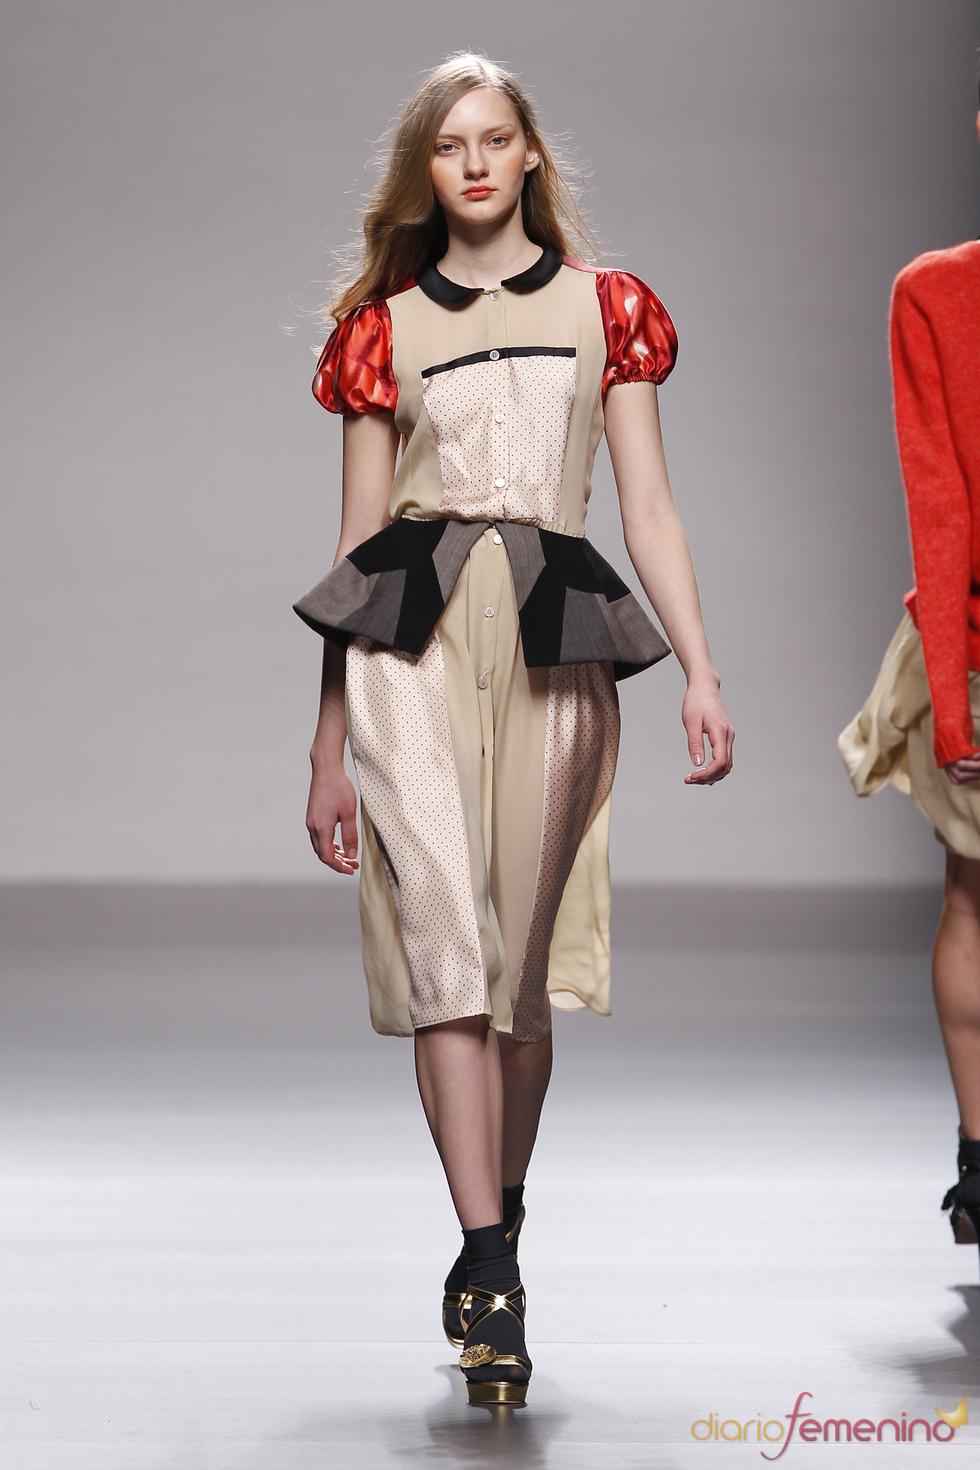 Fotos Moda: Lydia Delgado en Cibeles Madrid Fashion Week 2010